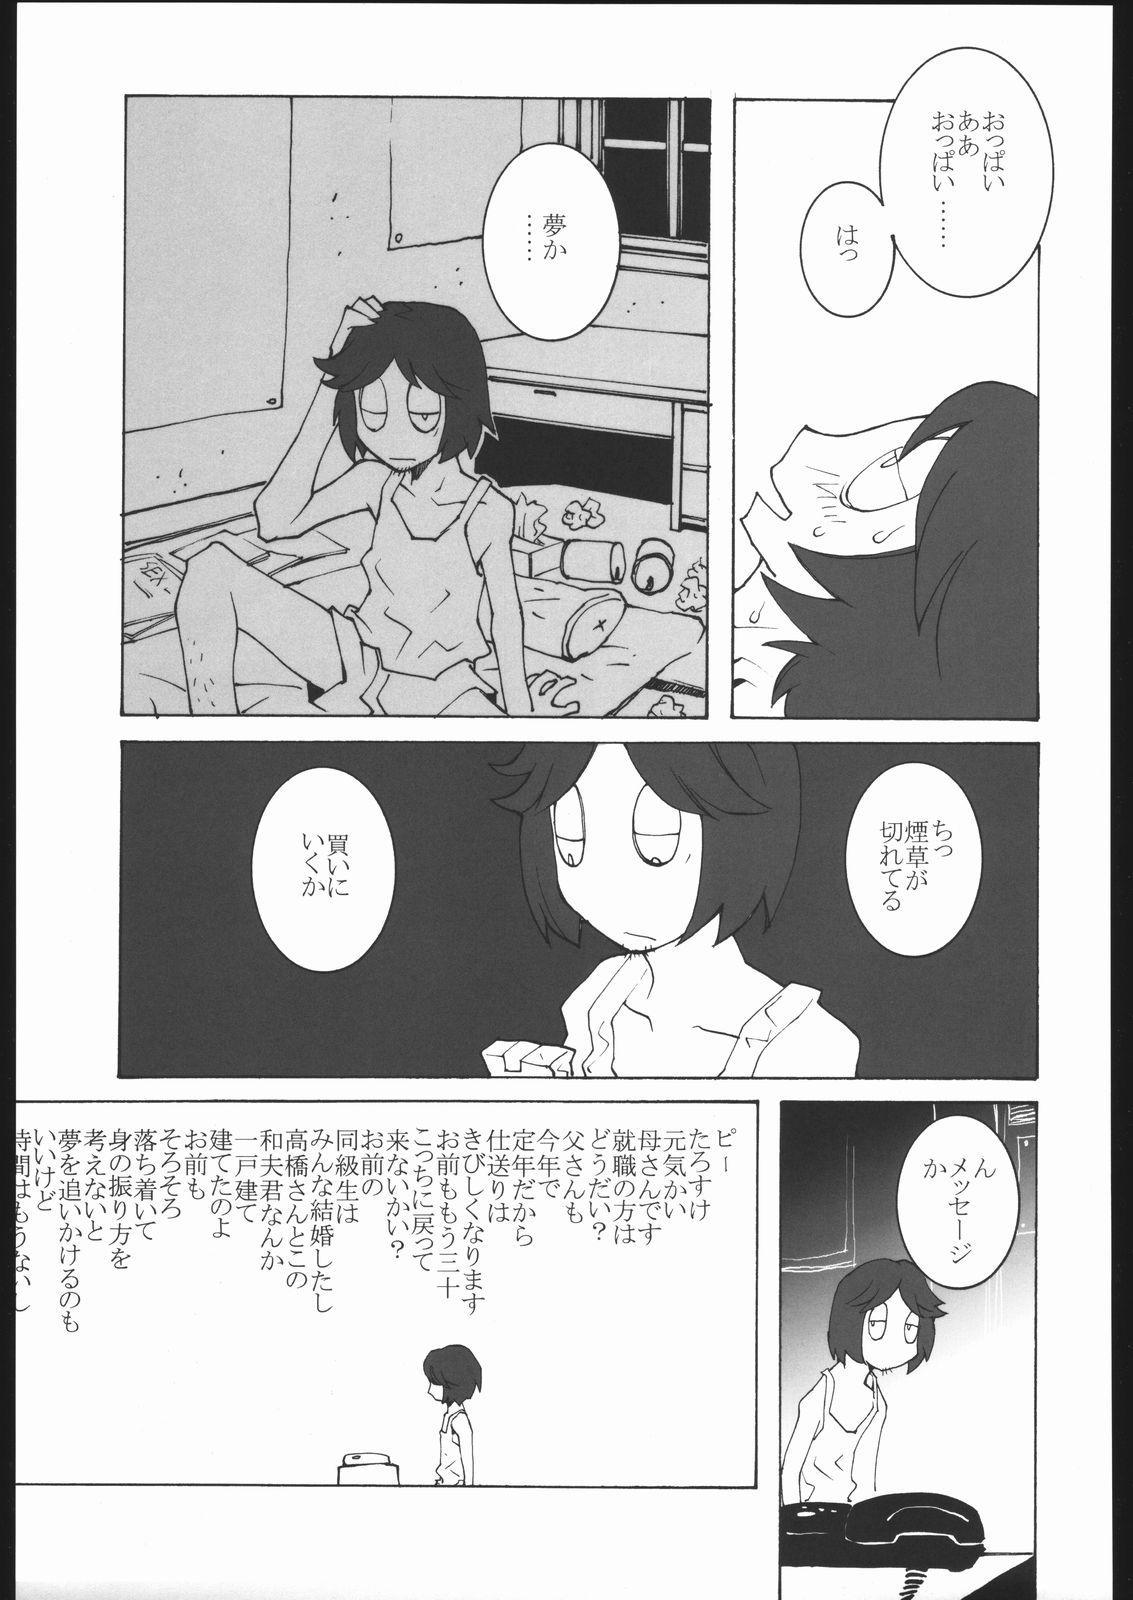 Adachi Misemono Club 188